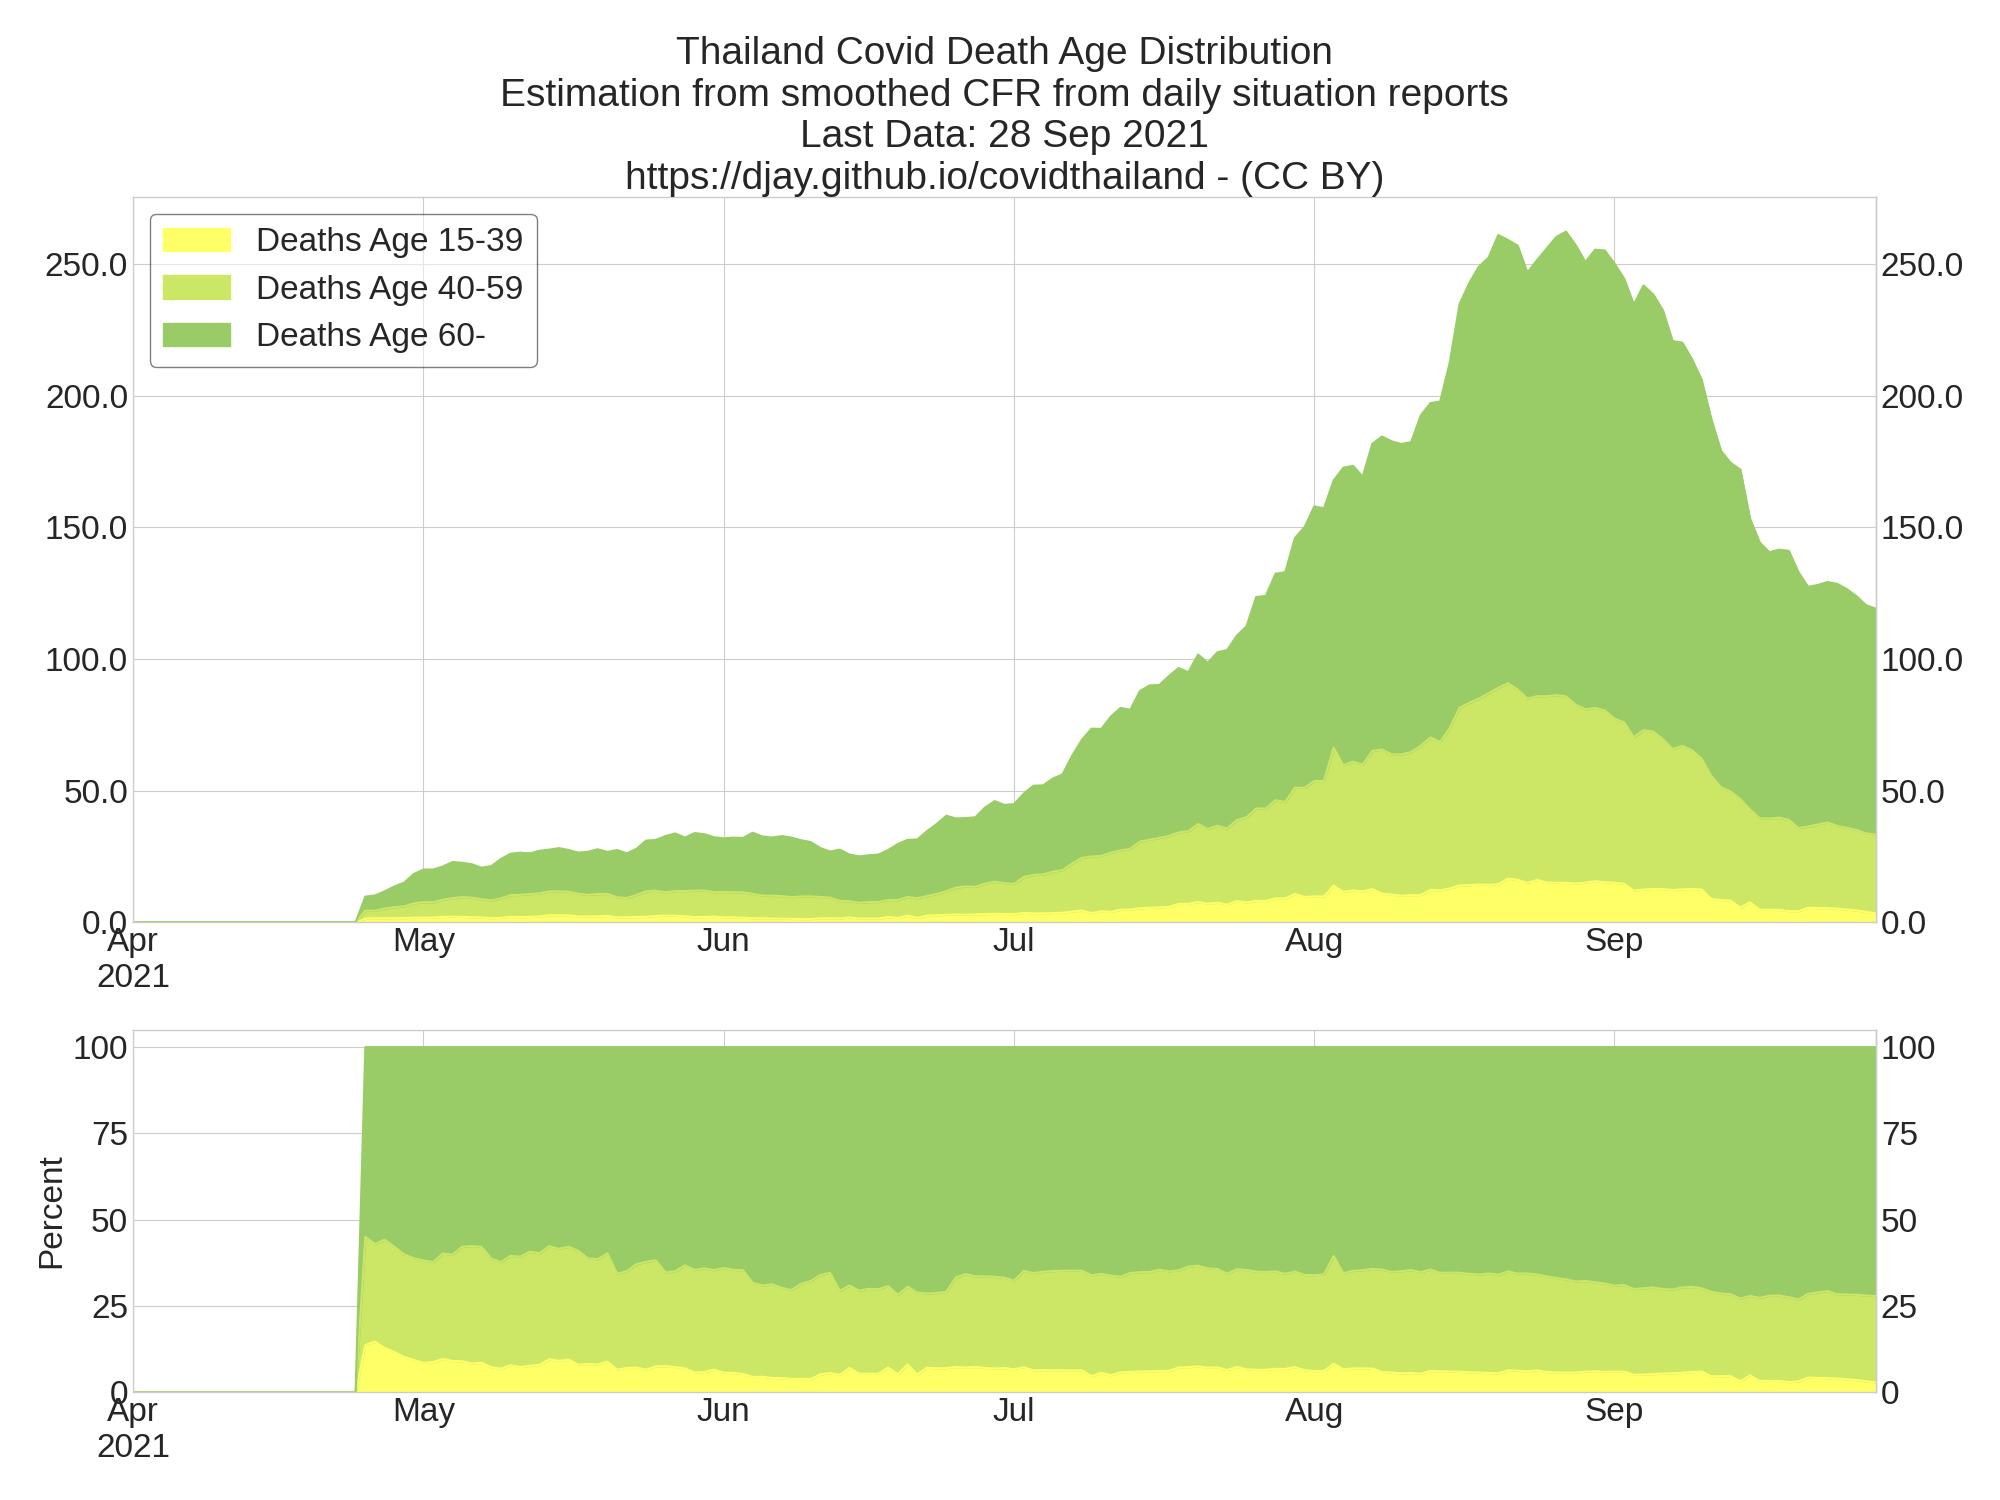 Thailand Covid Death Age Range